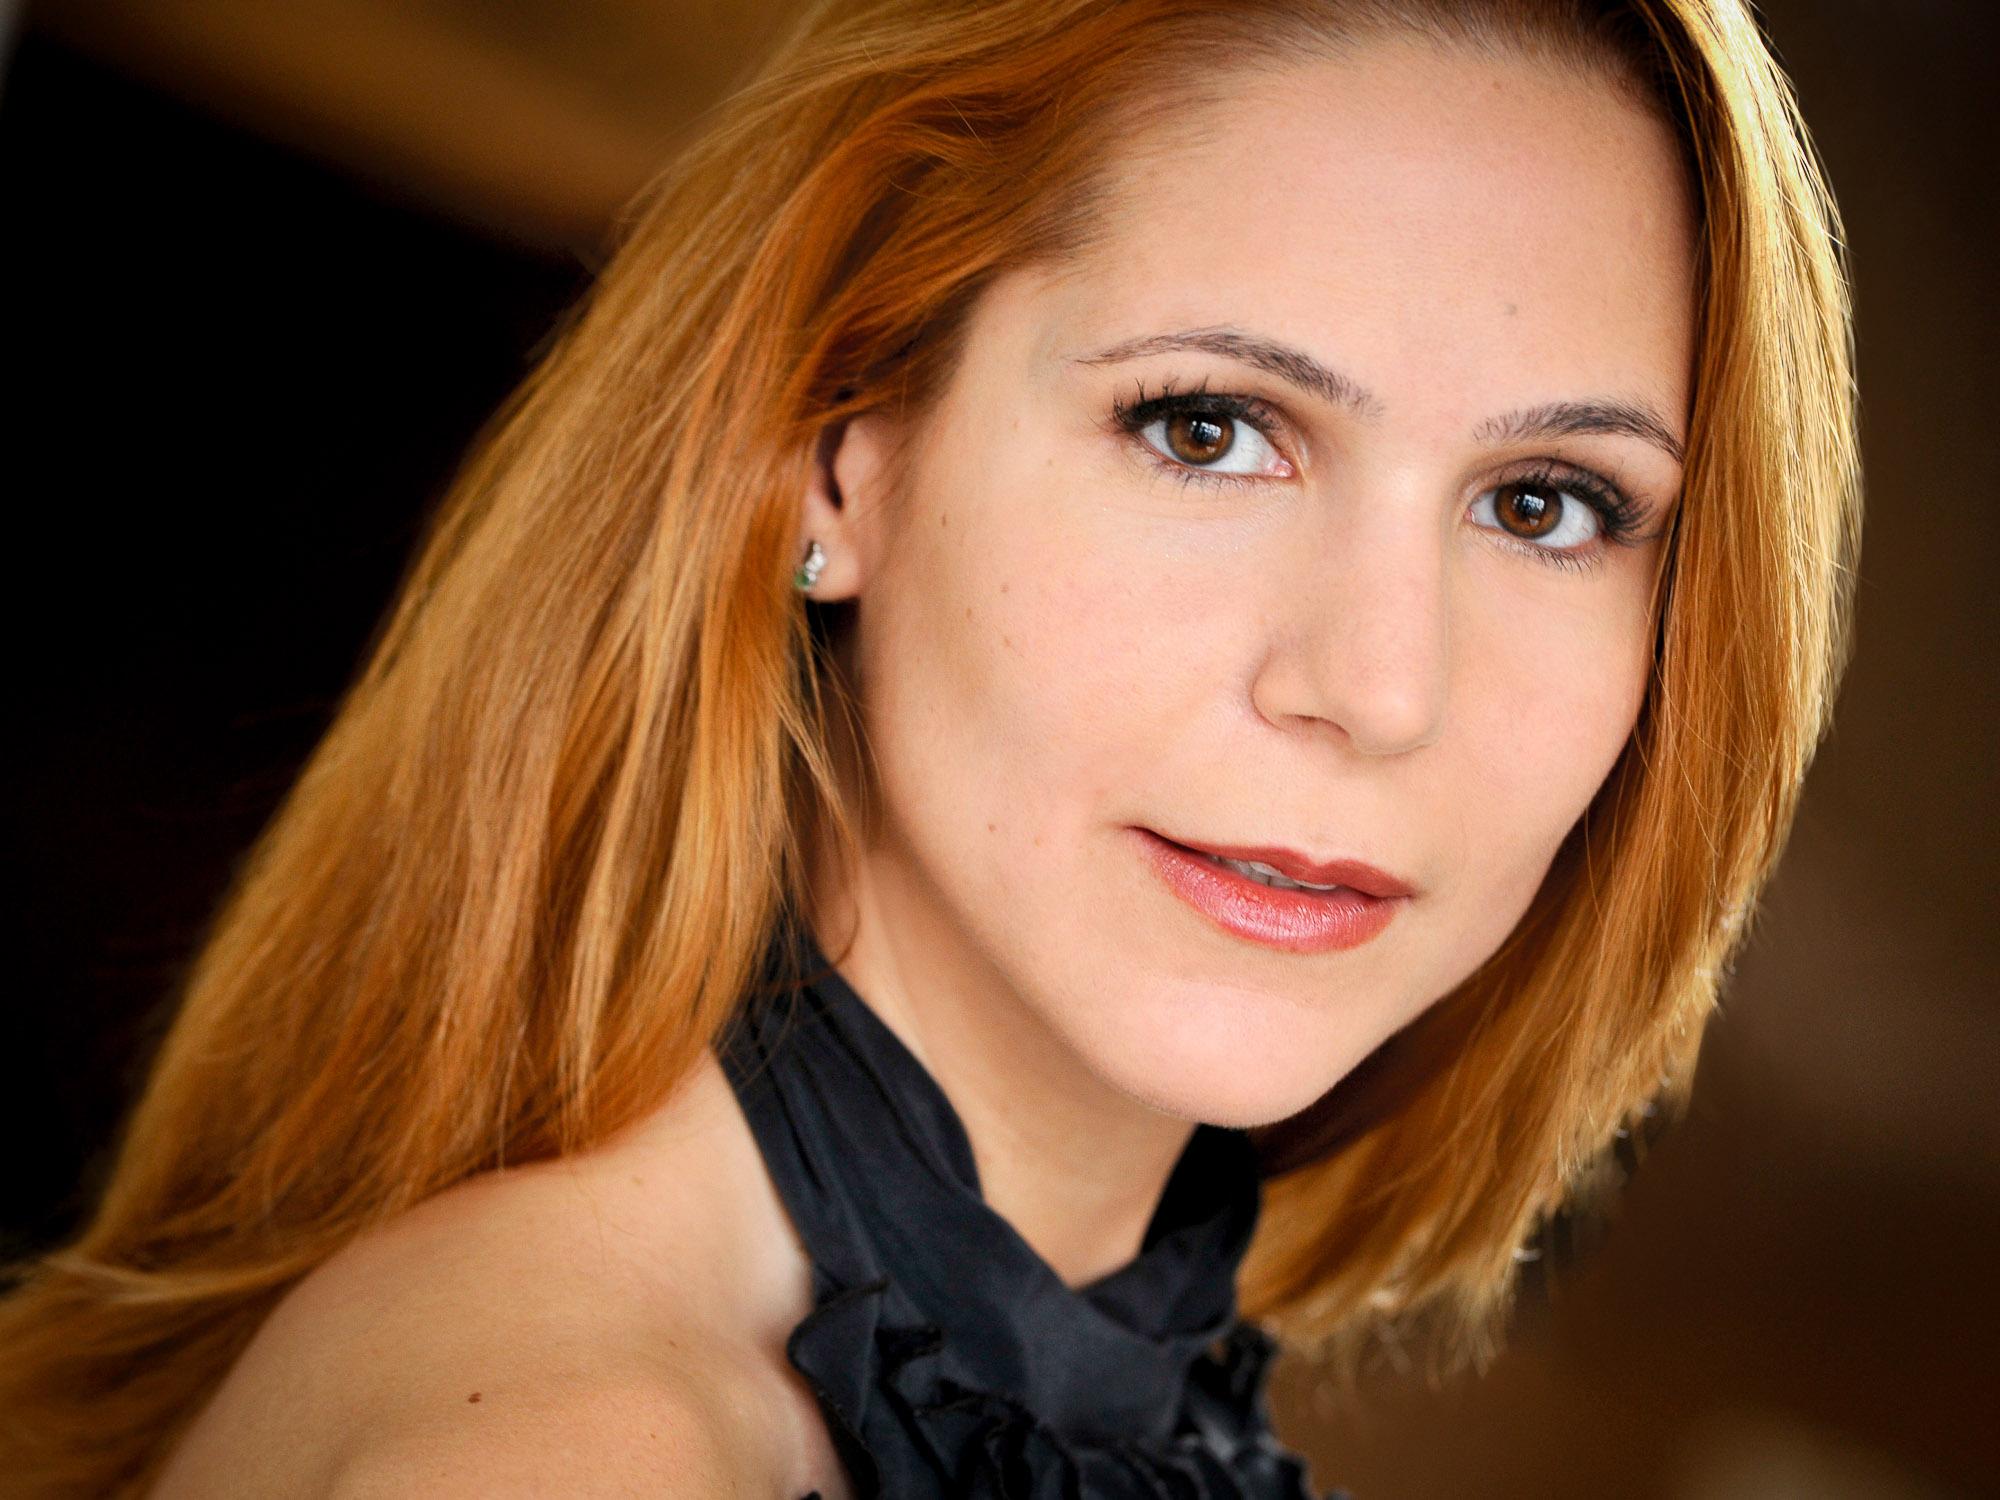 Headshots NYC - Actor Headshots Sarah T